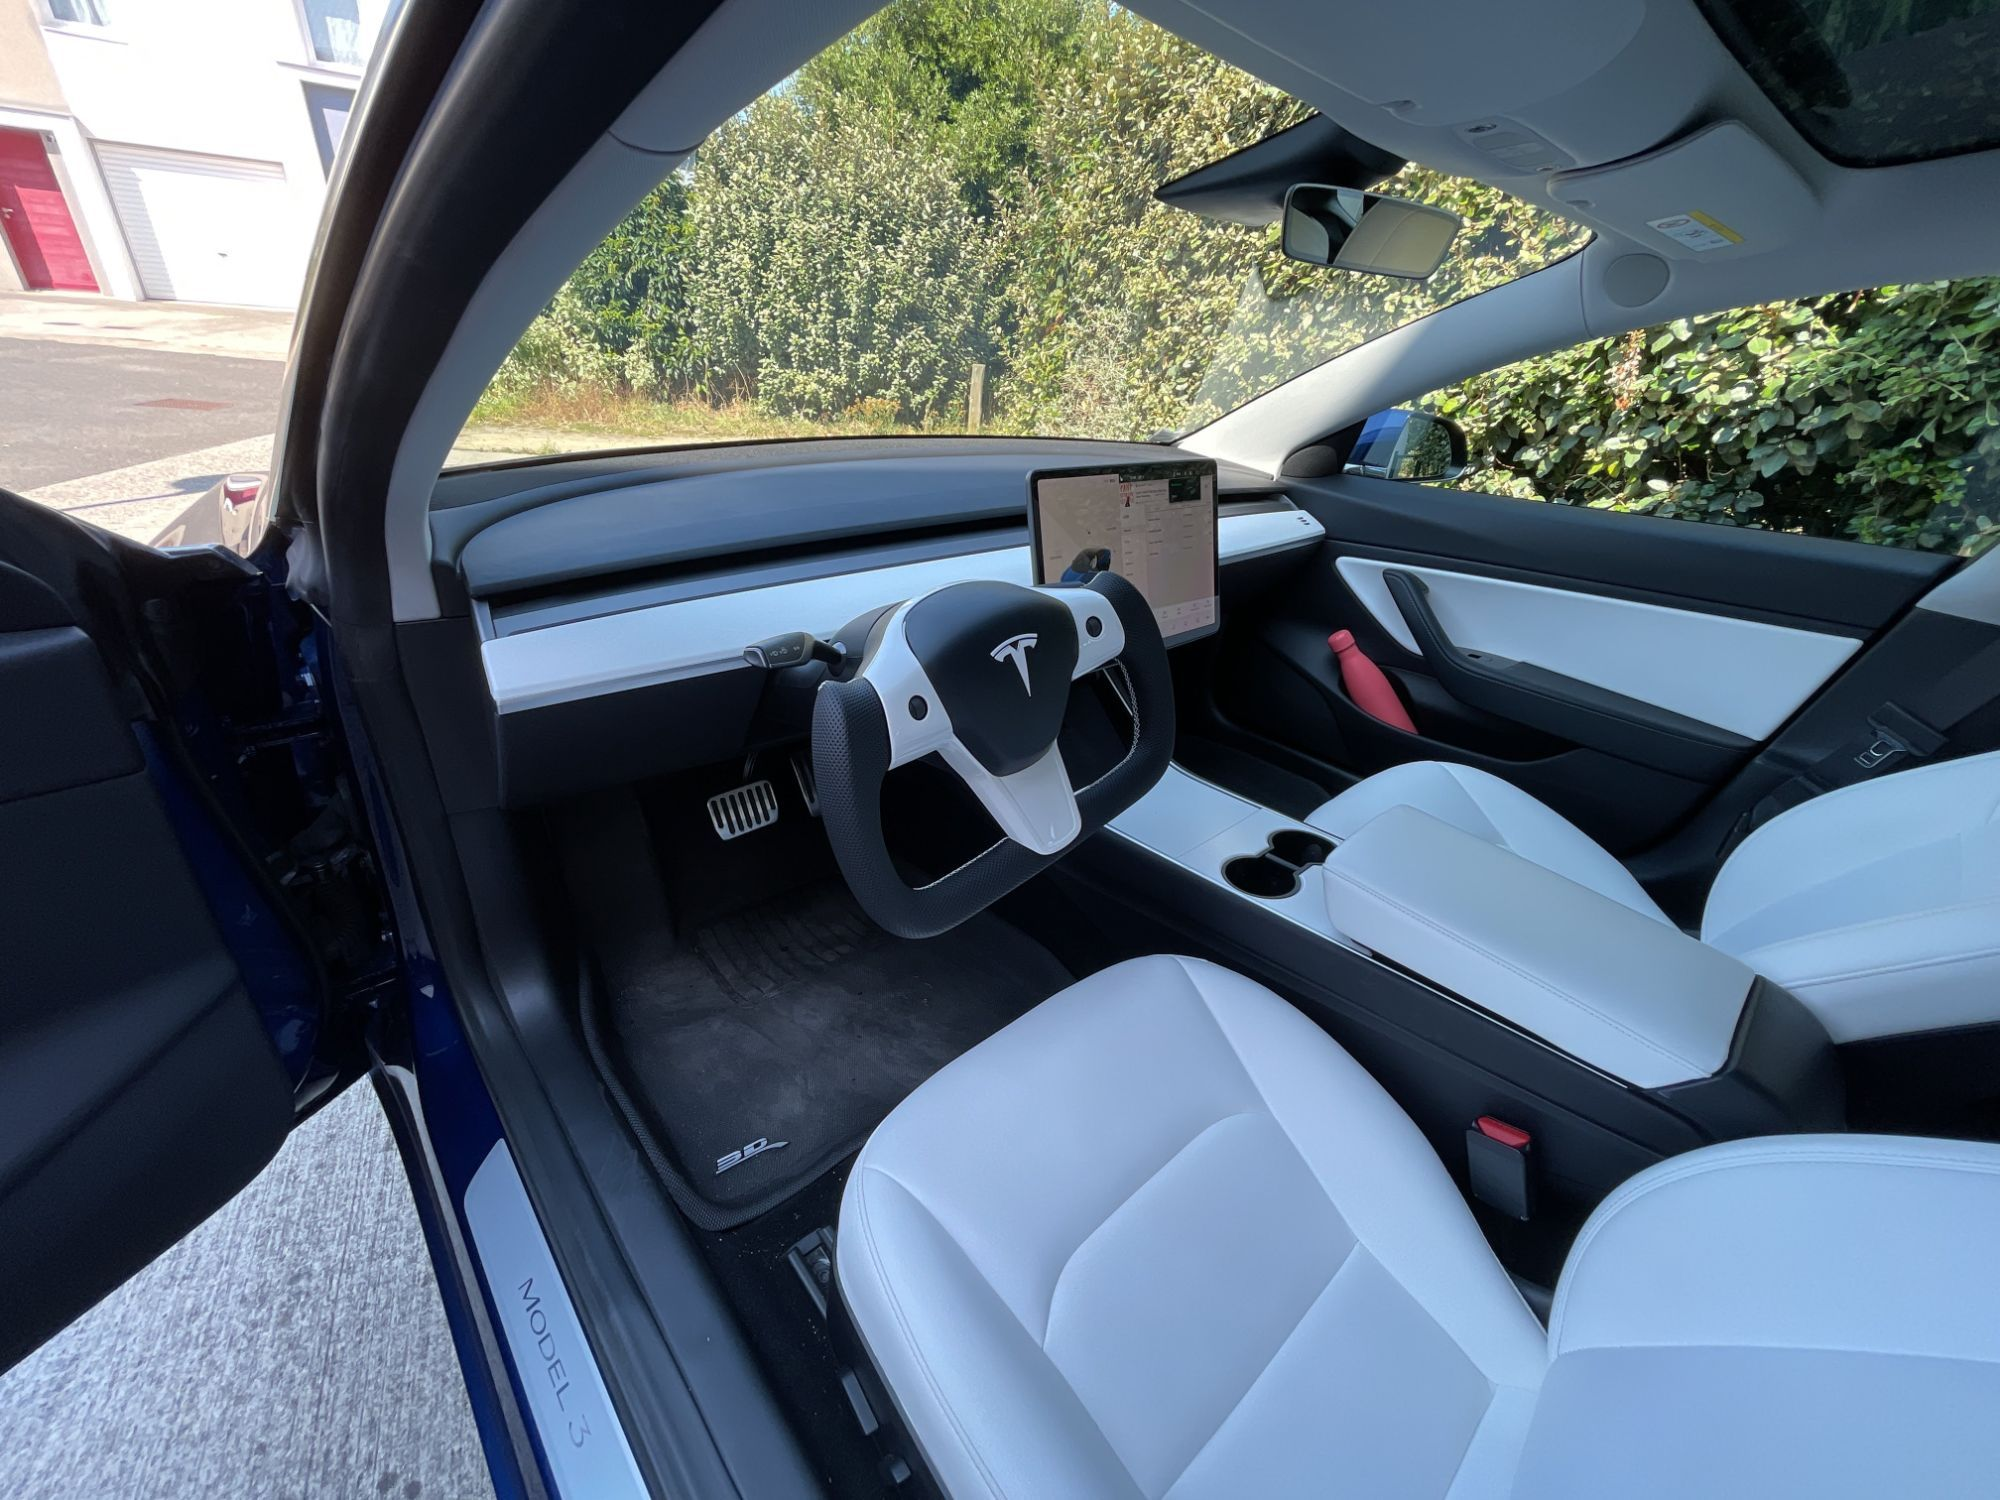 Volant Yoke Tesla Model 3 : comment l'installer et où l'acheter ?